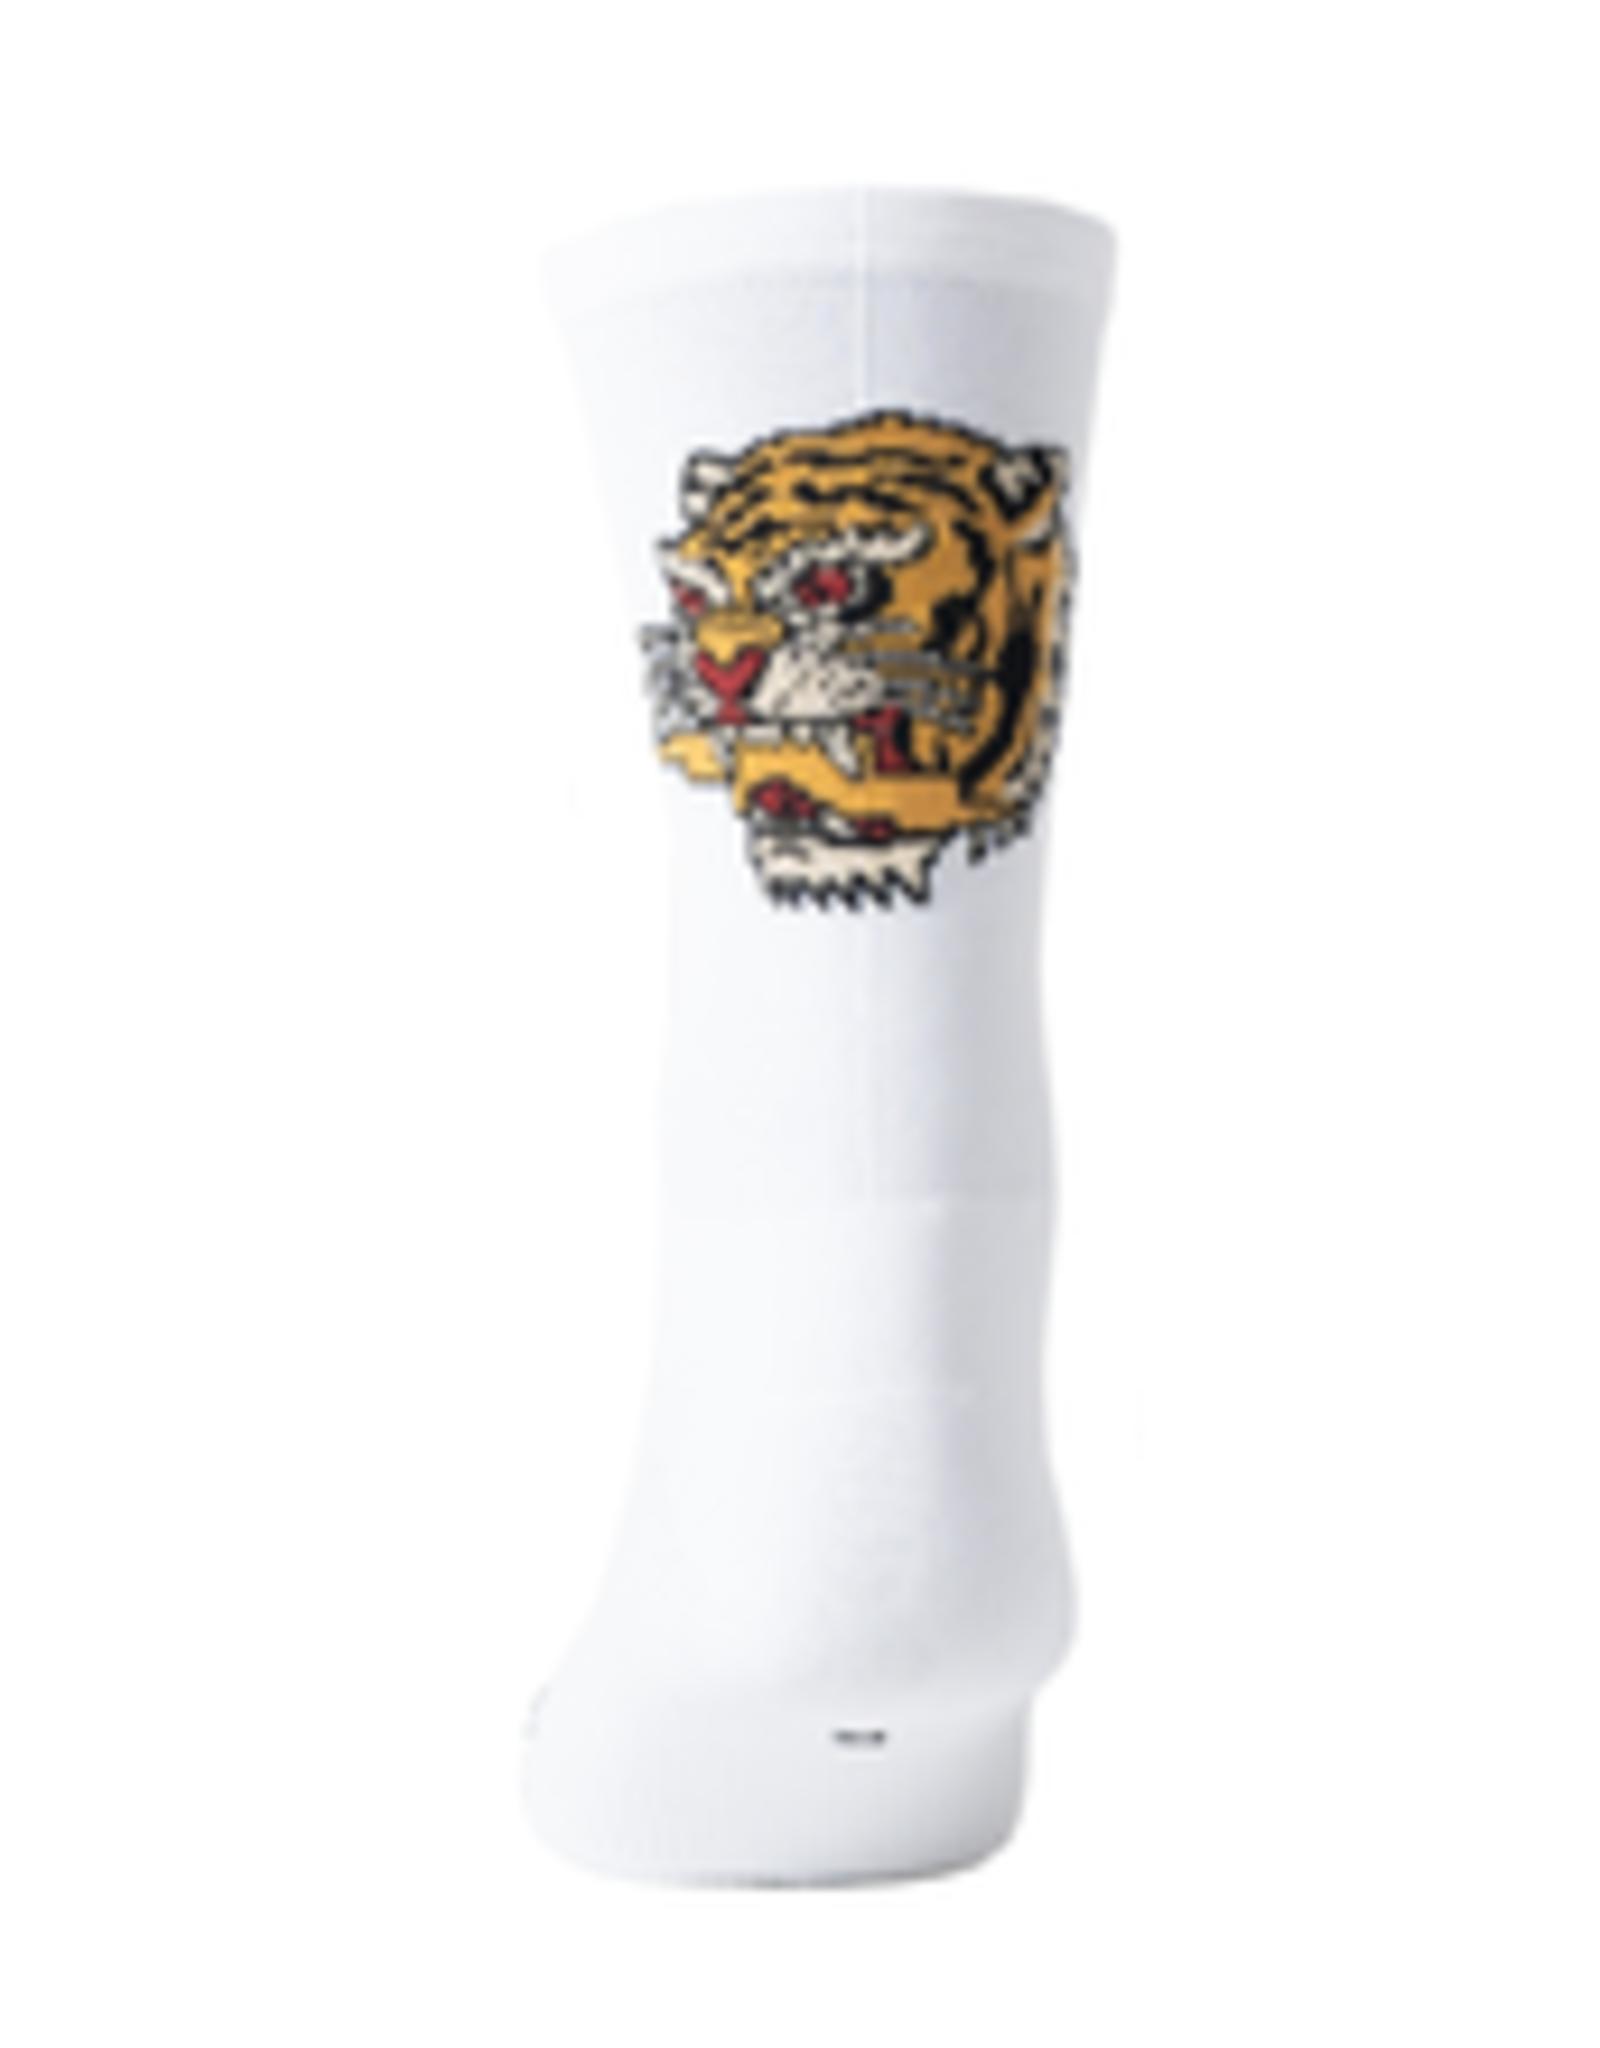 Pedal Mafia Fast Times White Sock L/XL